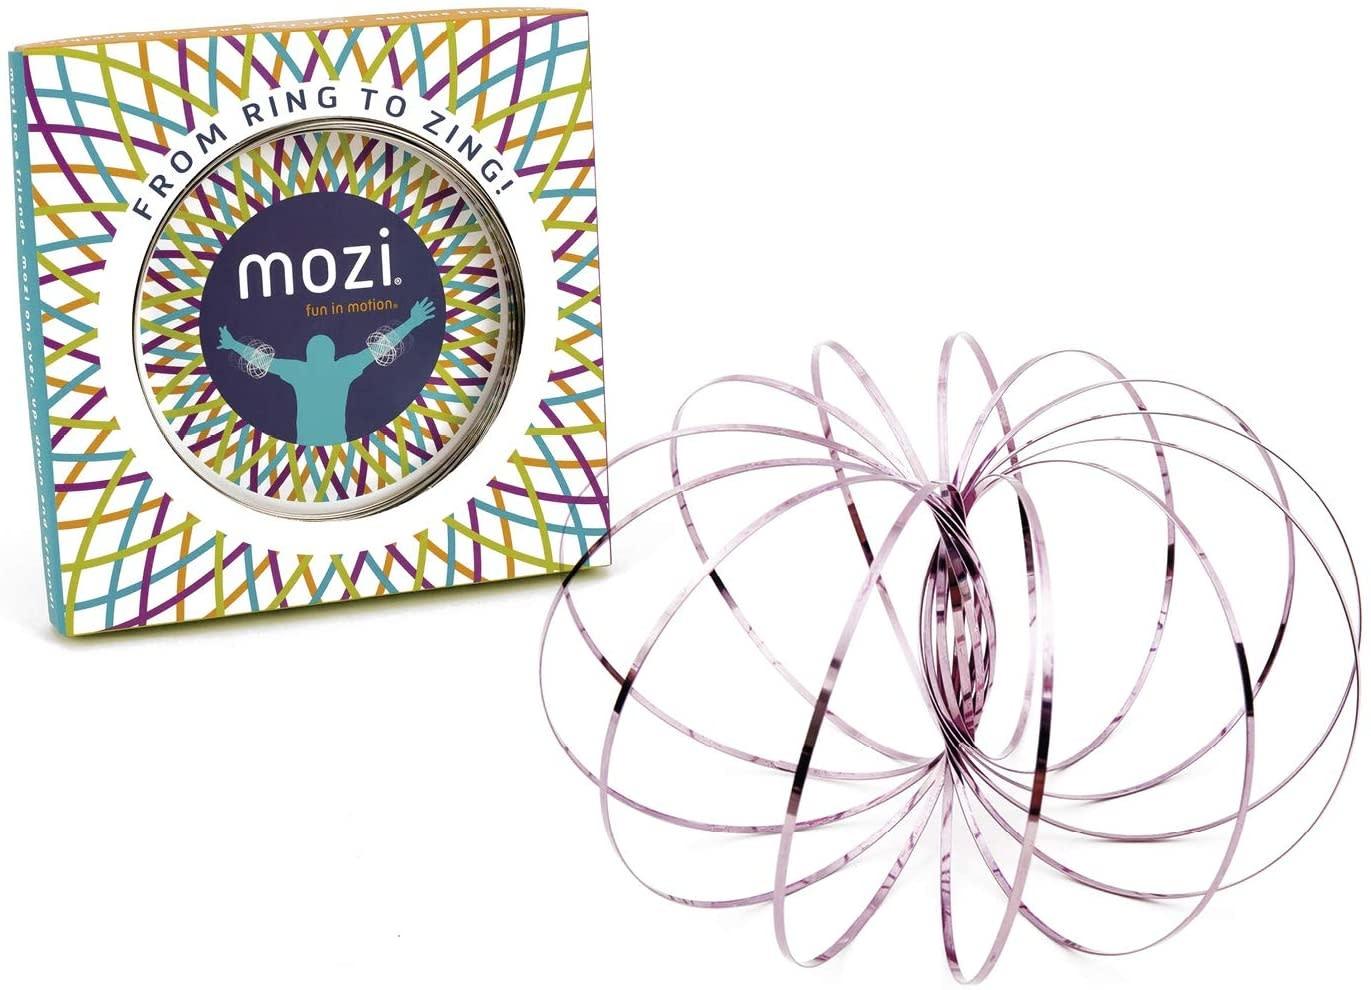 Mozi in Rose Quartz by Fun in Motion